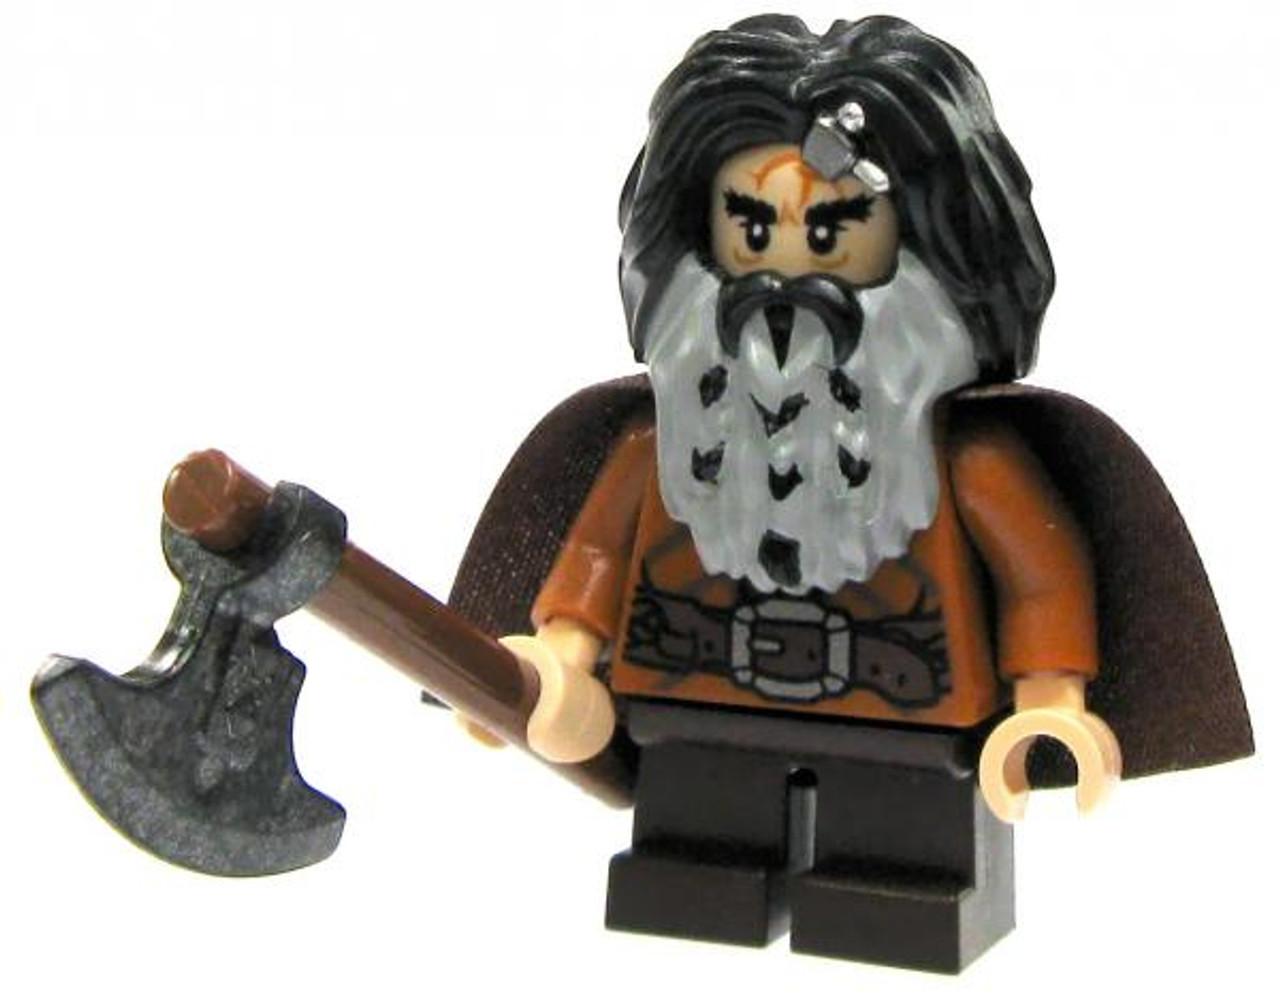 LEGO The Hobbit Gundabad Catapult Minifigure Accessory Loose